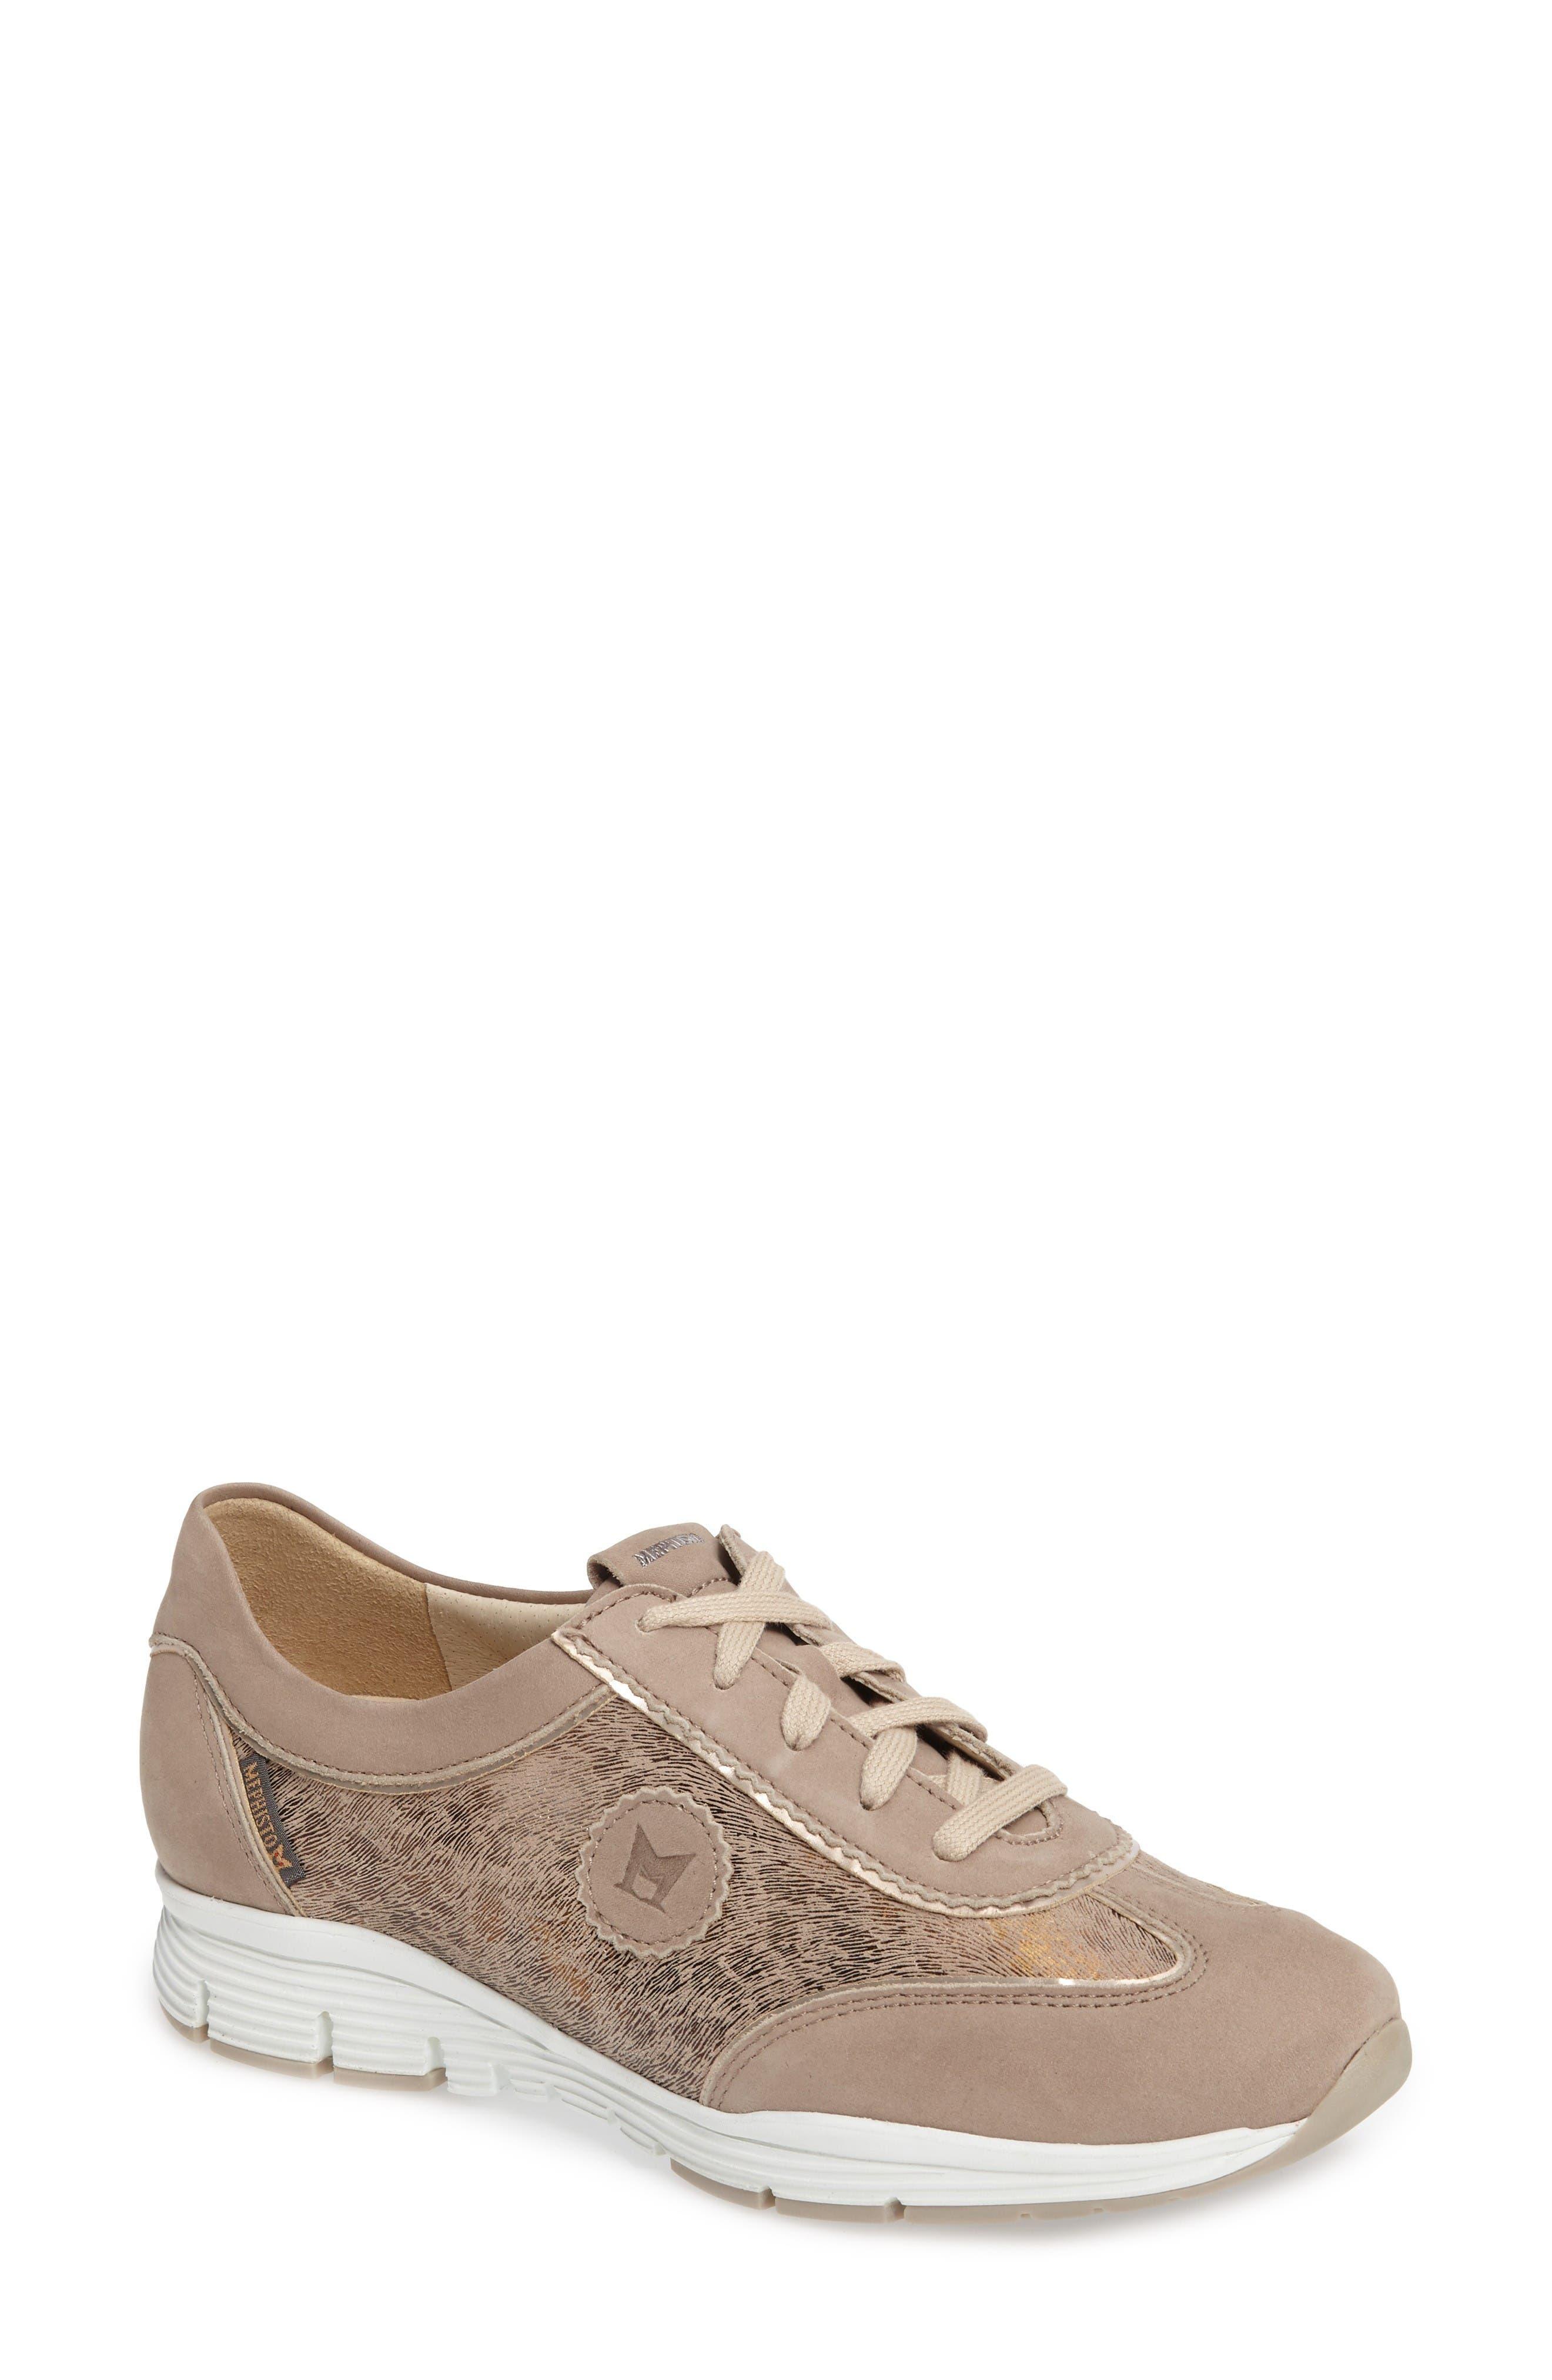 MEPHISTO Yael Soft-Air Sneaker